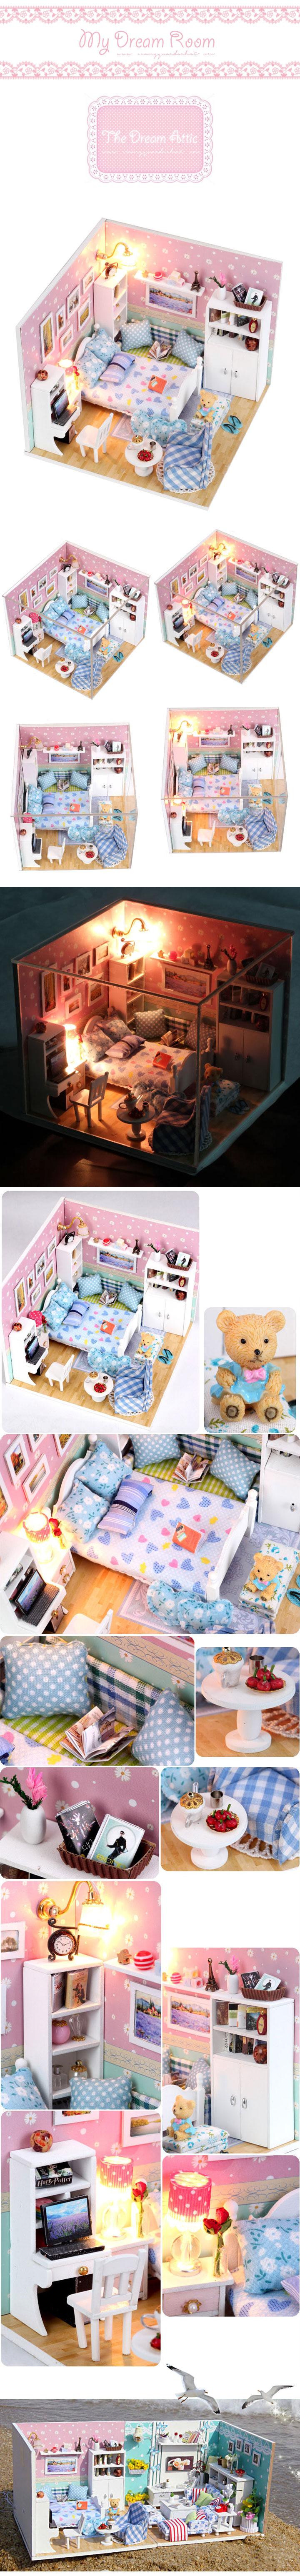 diy miniature dreamroom thedreamattic